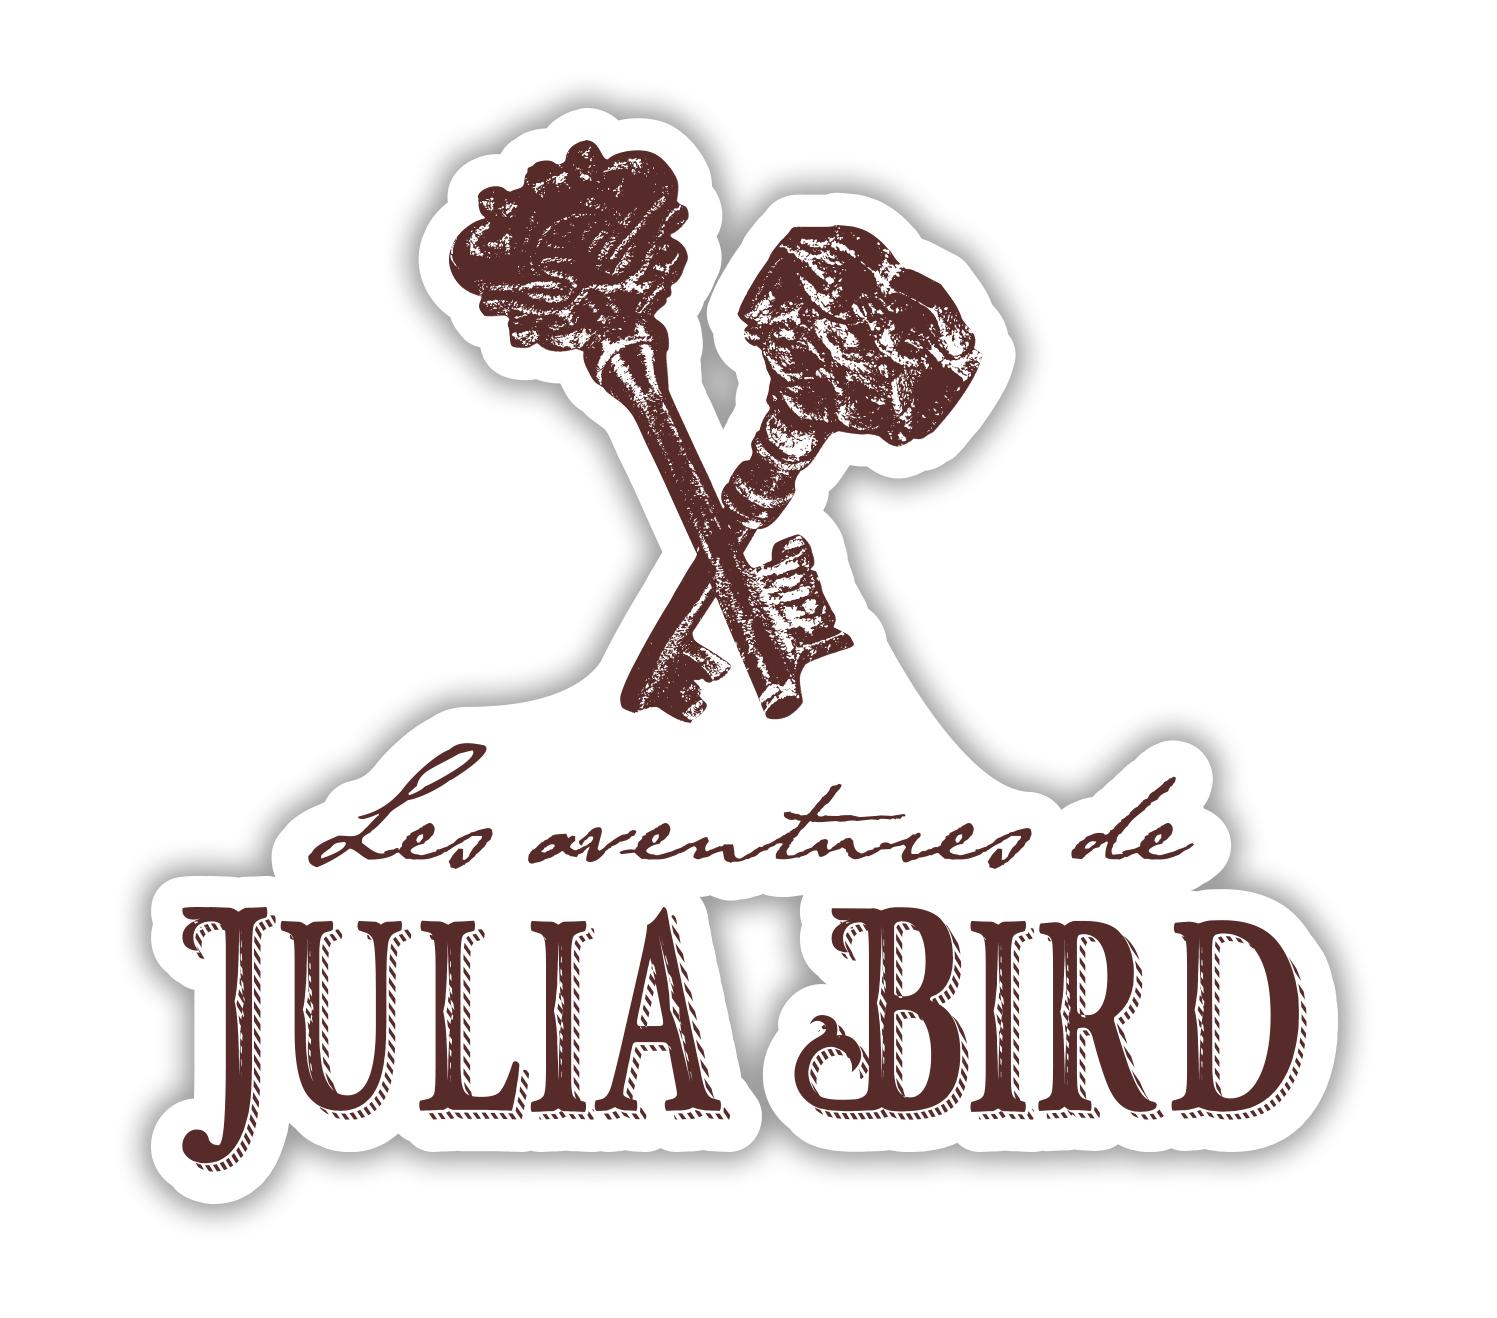 Adh_sif_Julia_Bird-1505858677.jpg